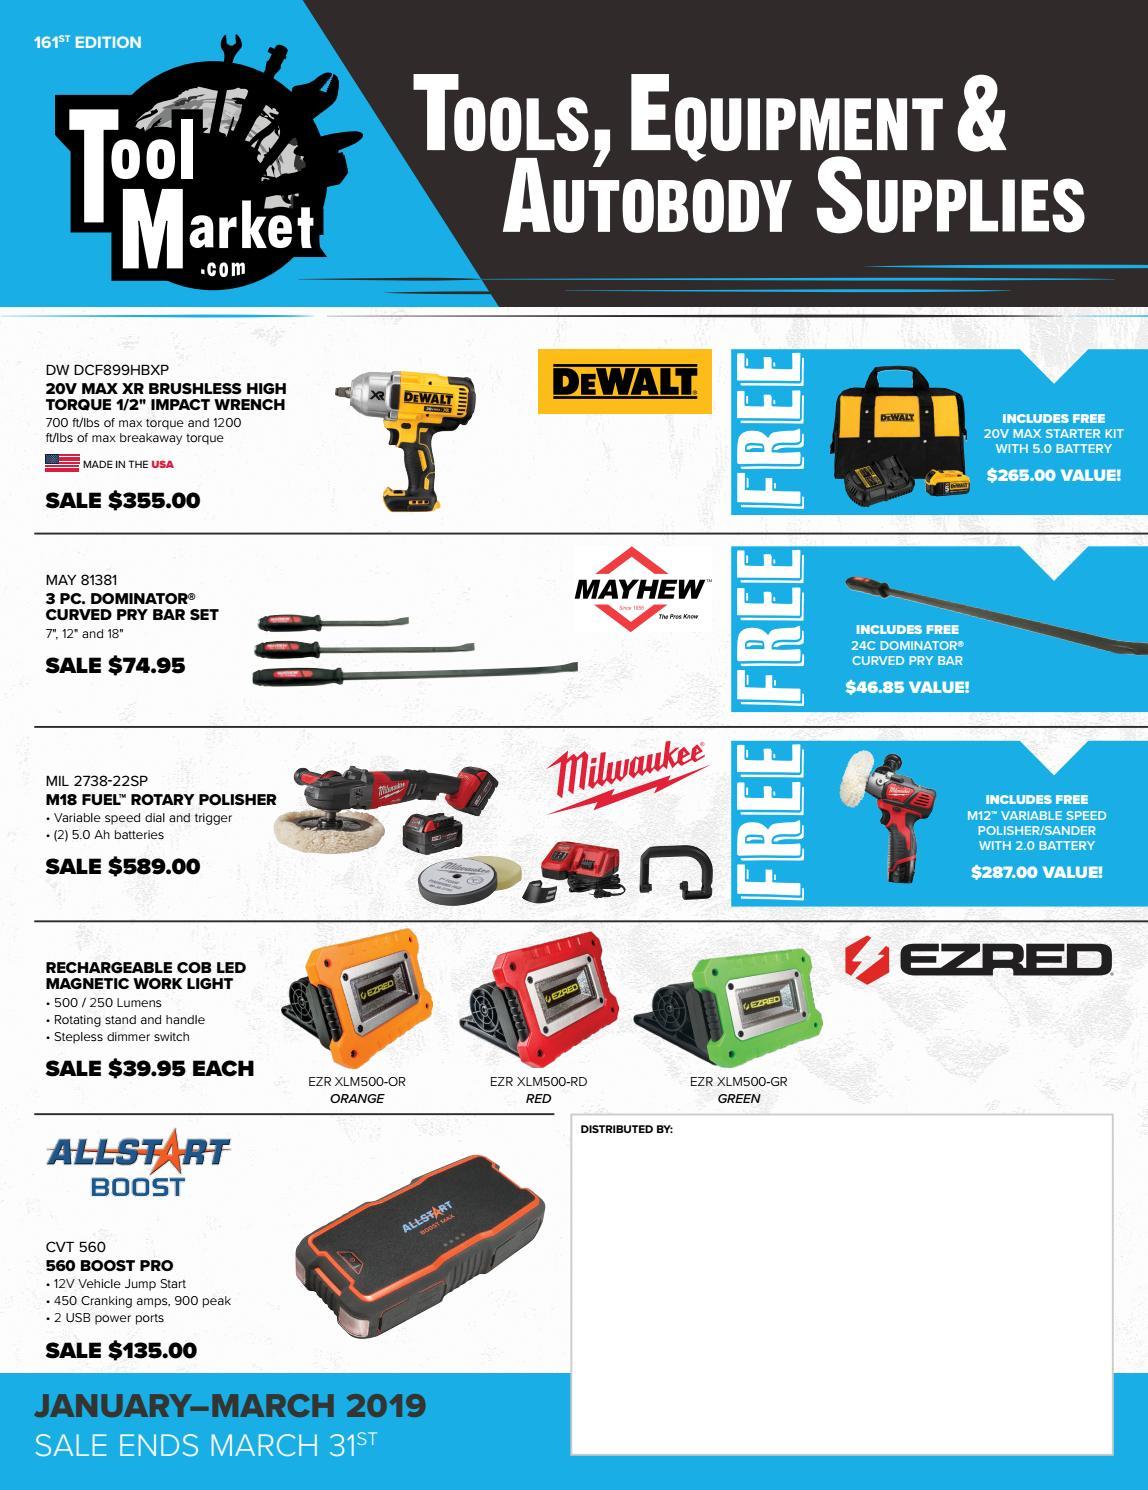 Tool Market Catalog by Neu Tool   Supply Corp. - issuu 1410d71b7f